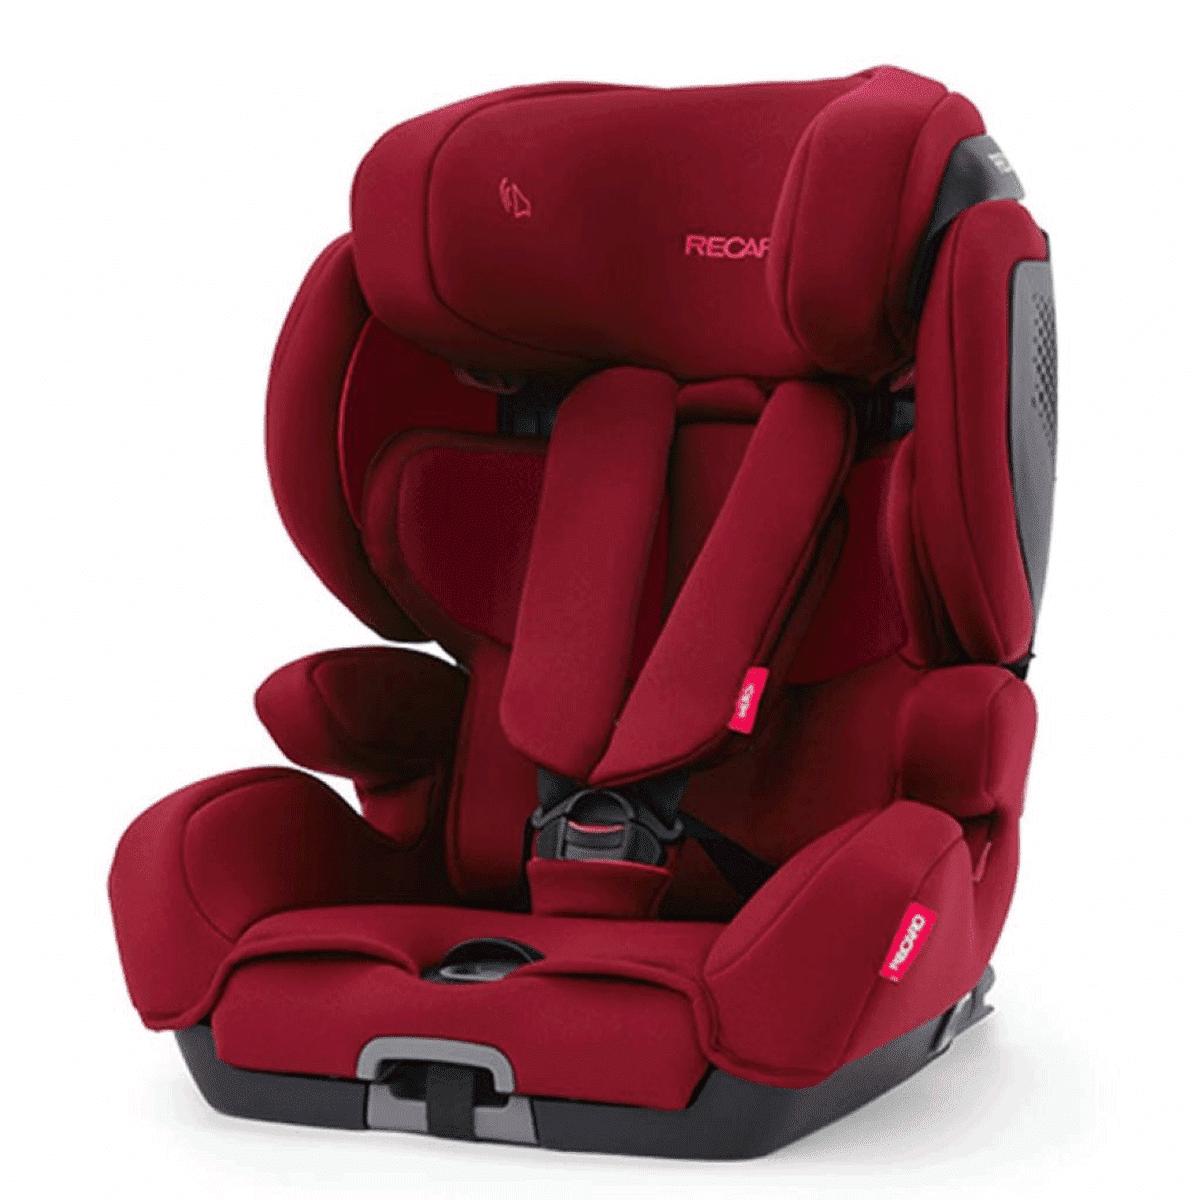 Tian Elite Select Garnet Red